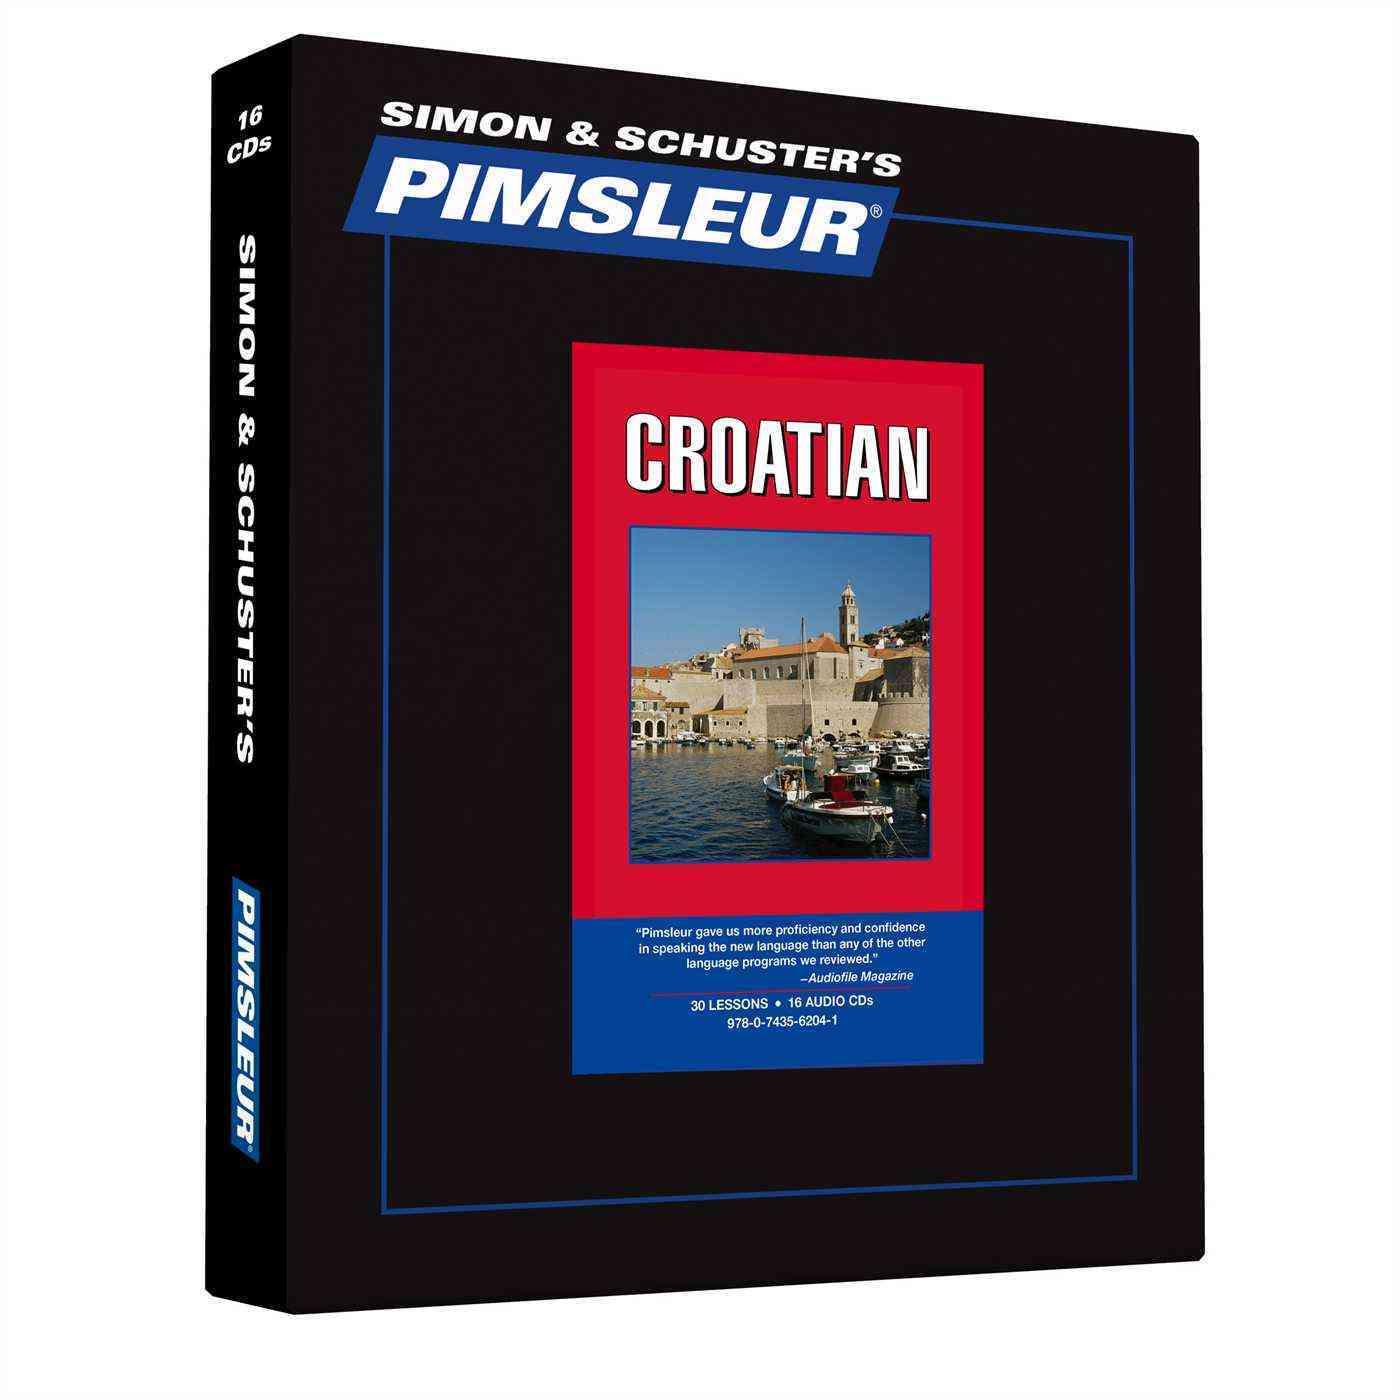 Simon & Schuster's Pimsleur: Croatian (CD-Audio)